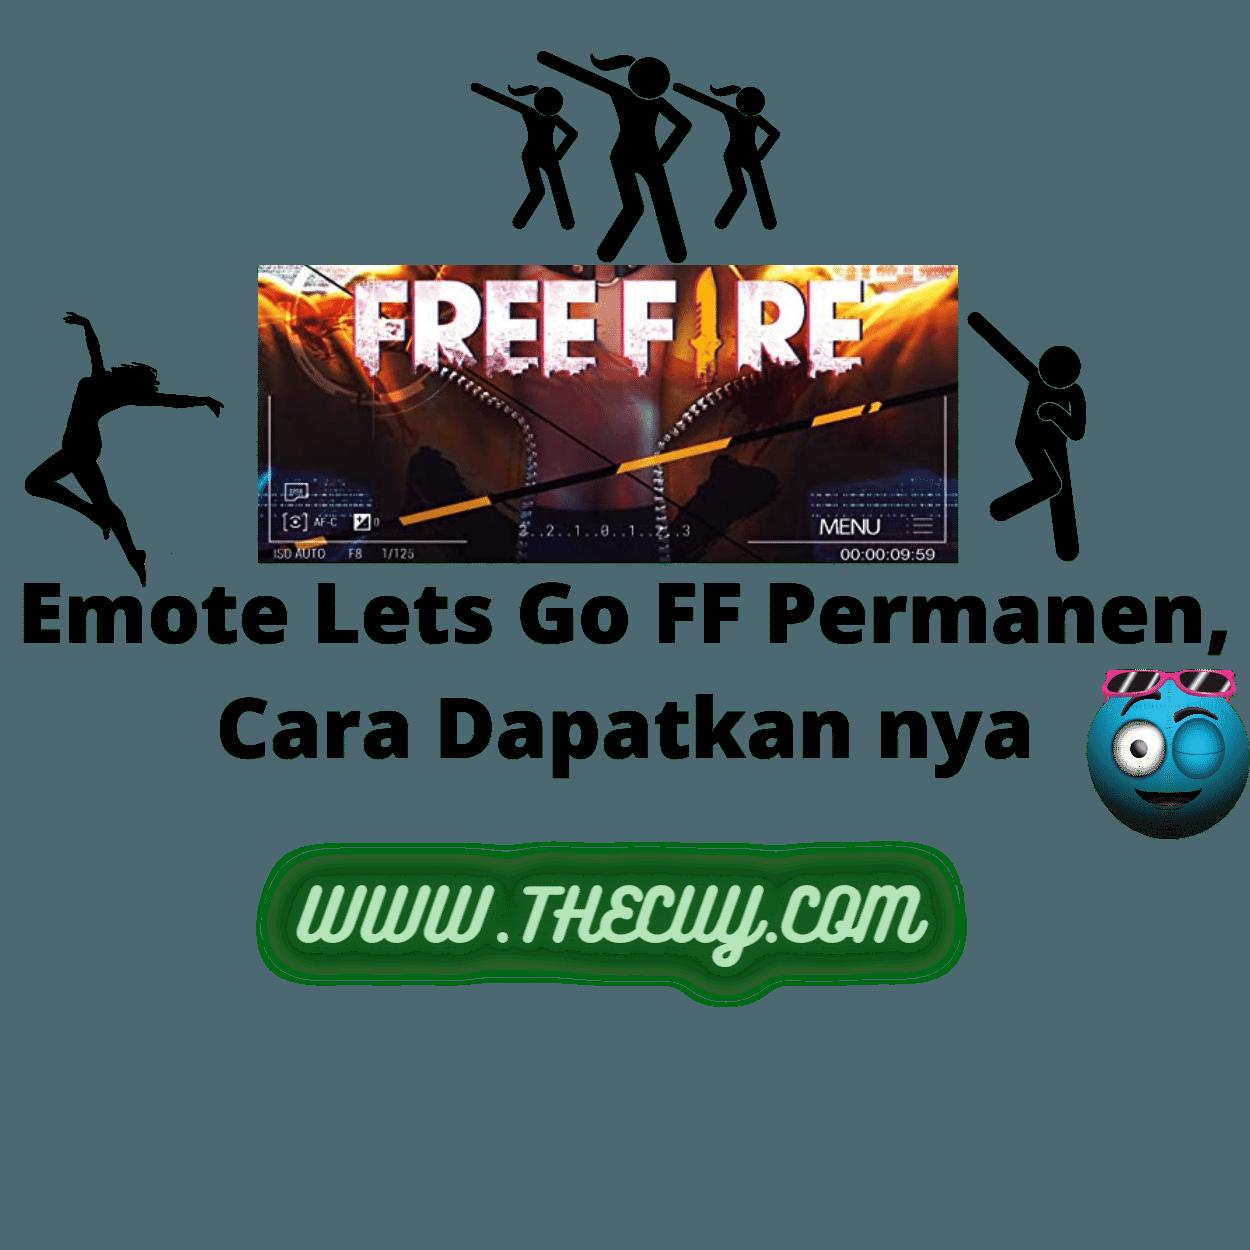 Emote Lets Go FF Permanen, Cara Dapatkan nya